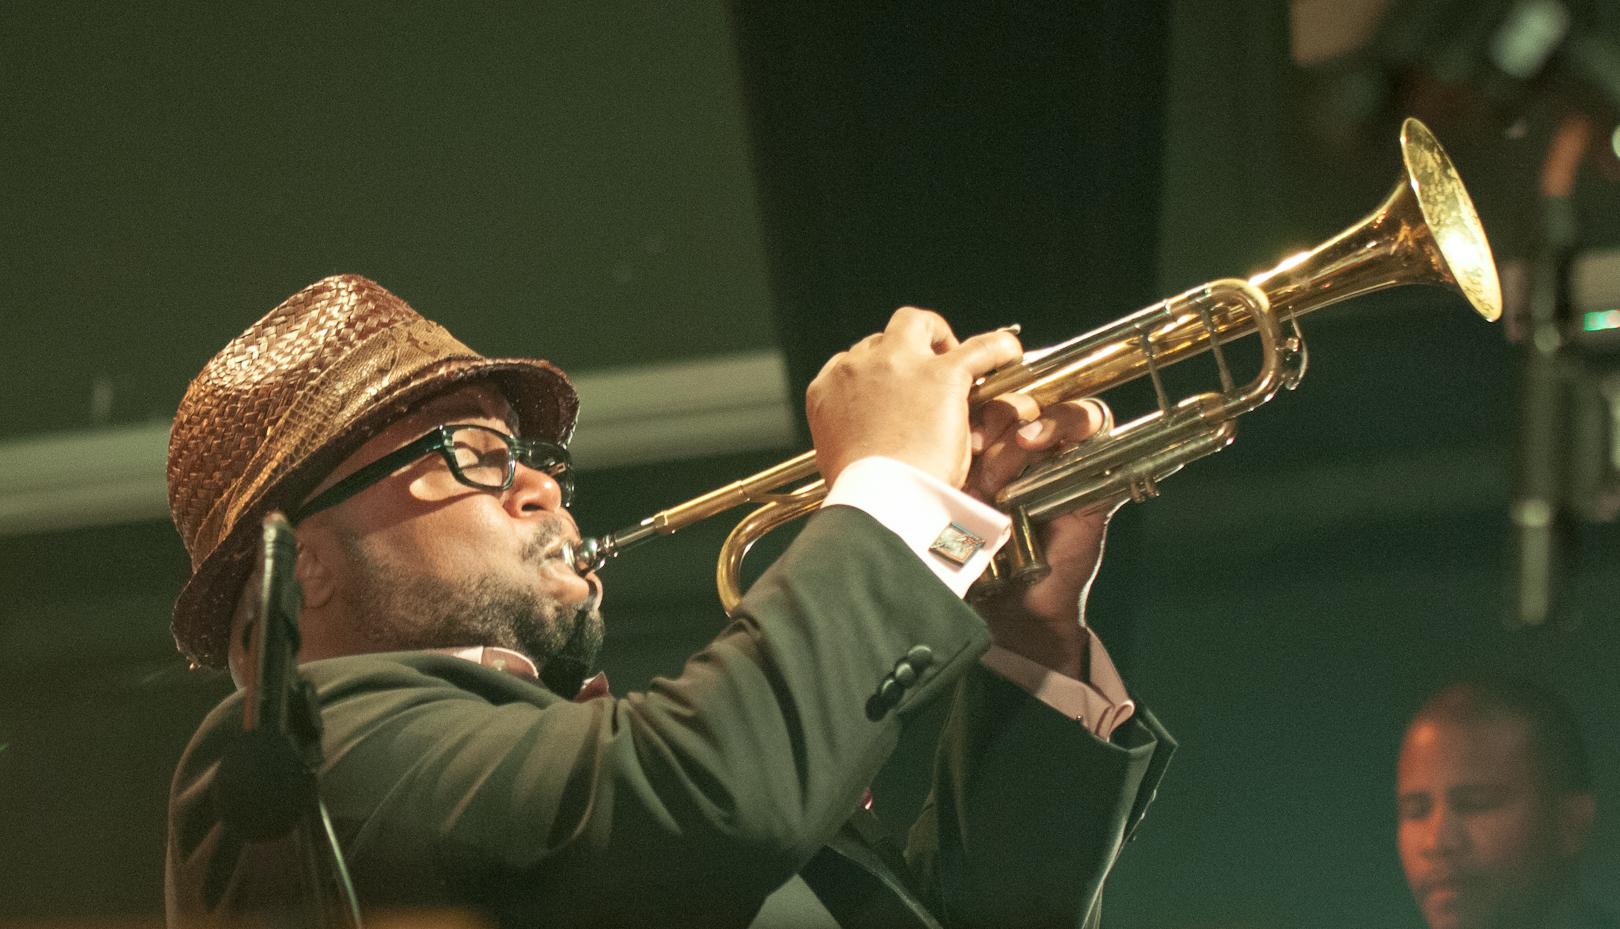 Nicholas Payton with Ninety Miles at the Montreal International Jazz Festival 2012